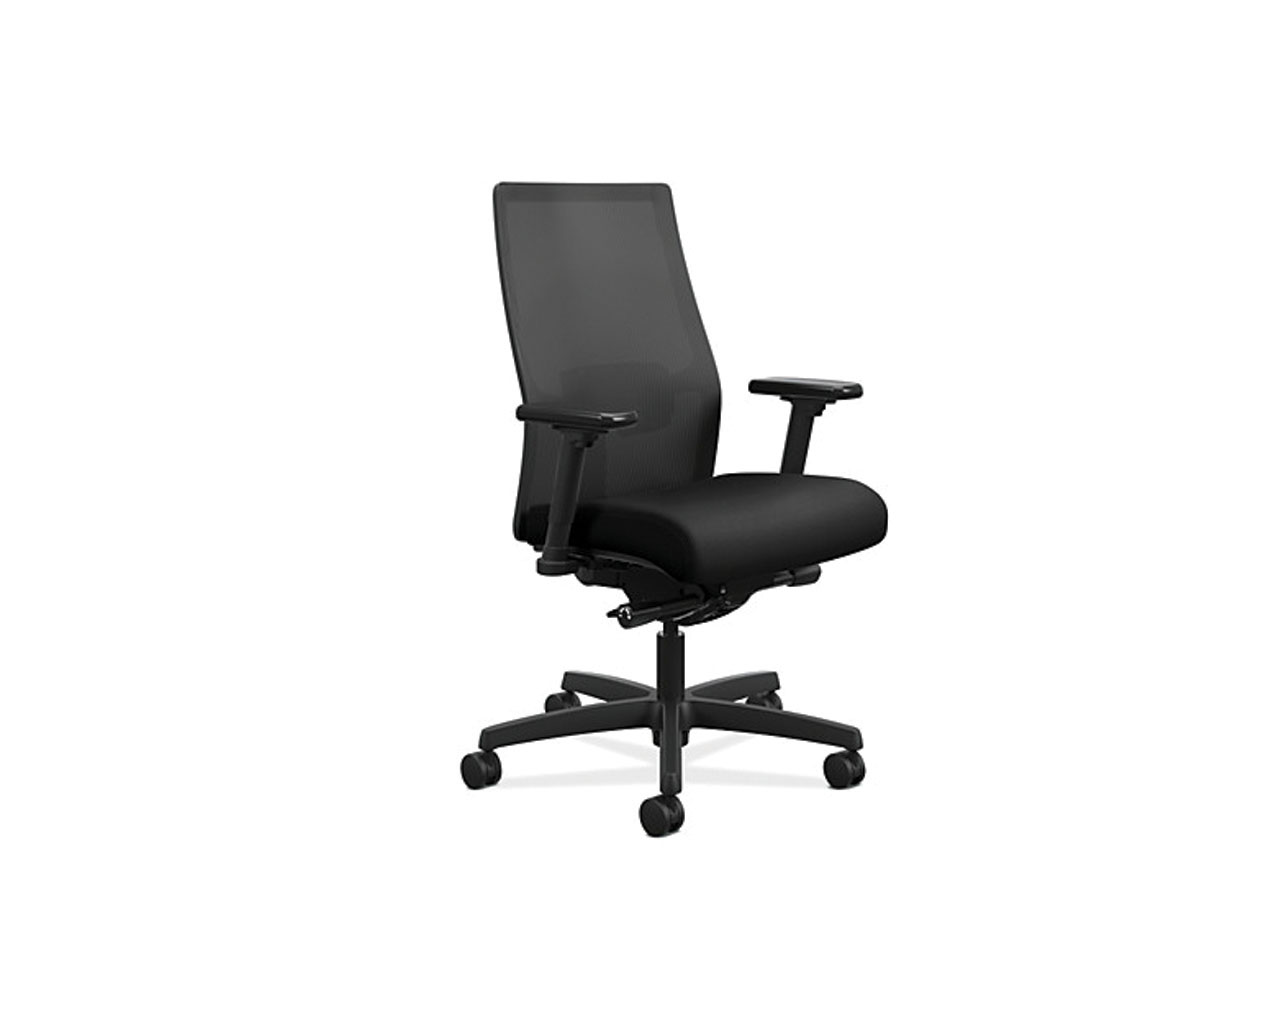 2 seat chairs ergonomic chair uk ikea hon ignition mid back task